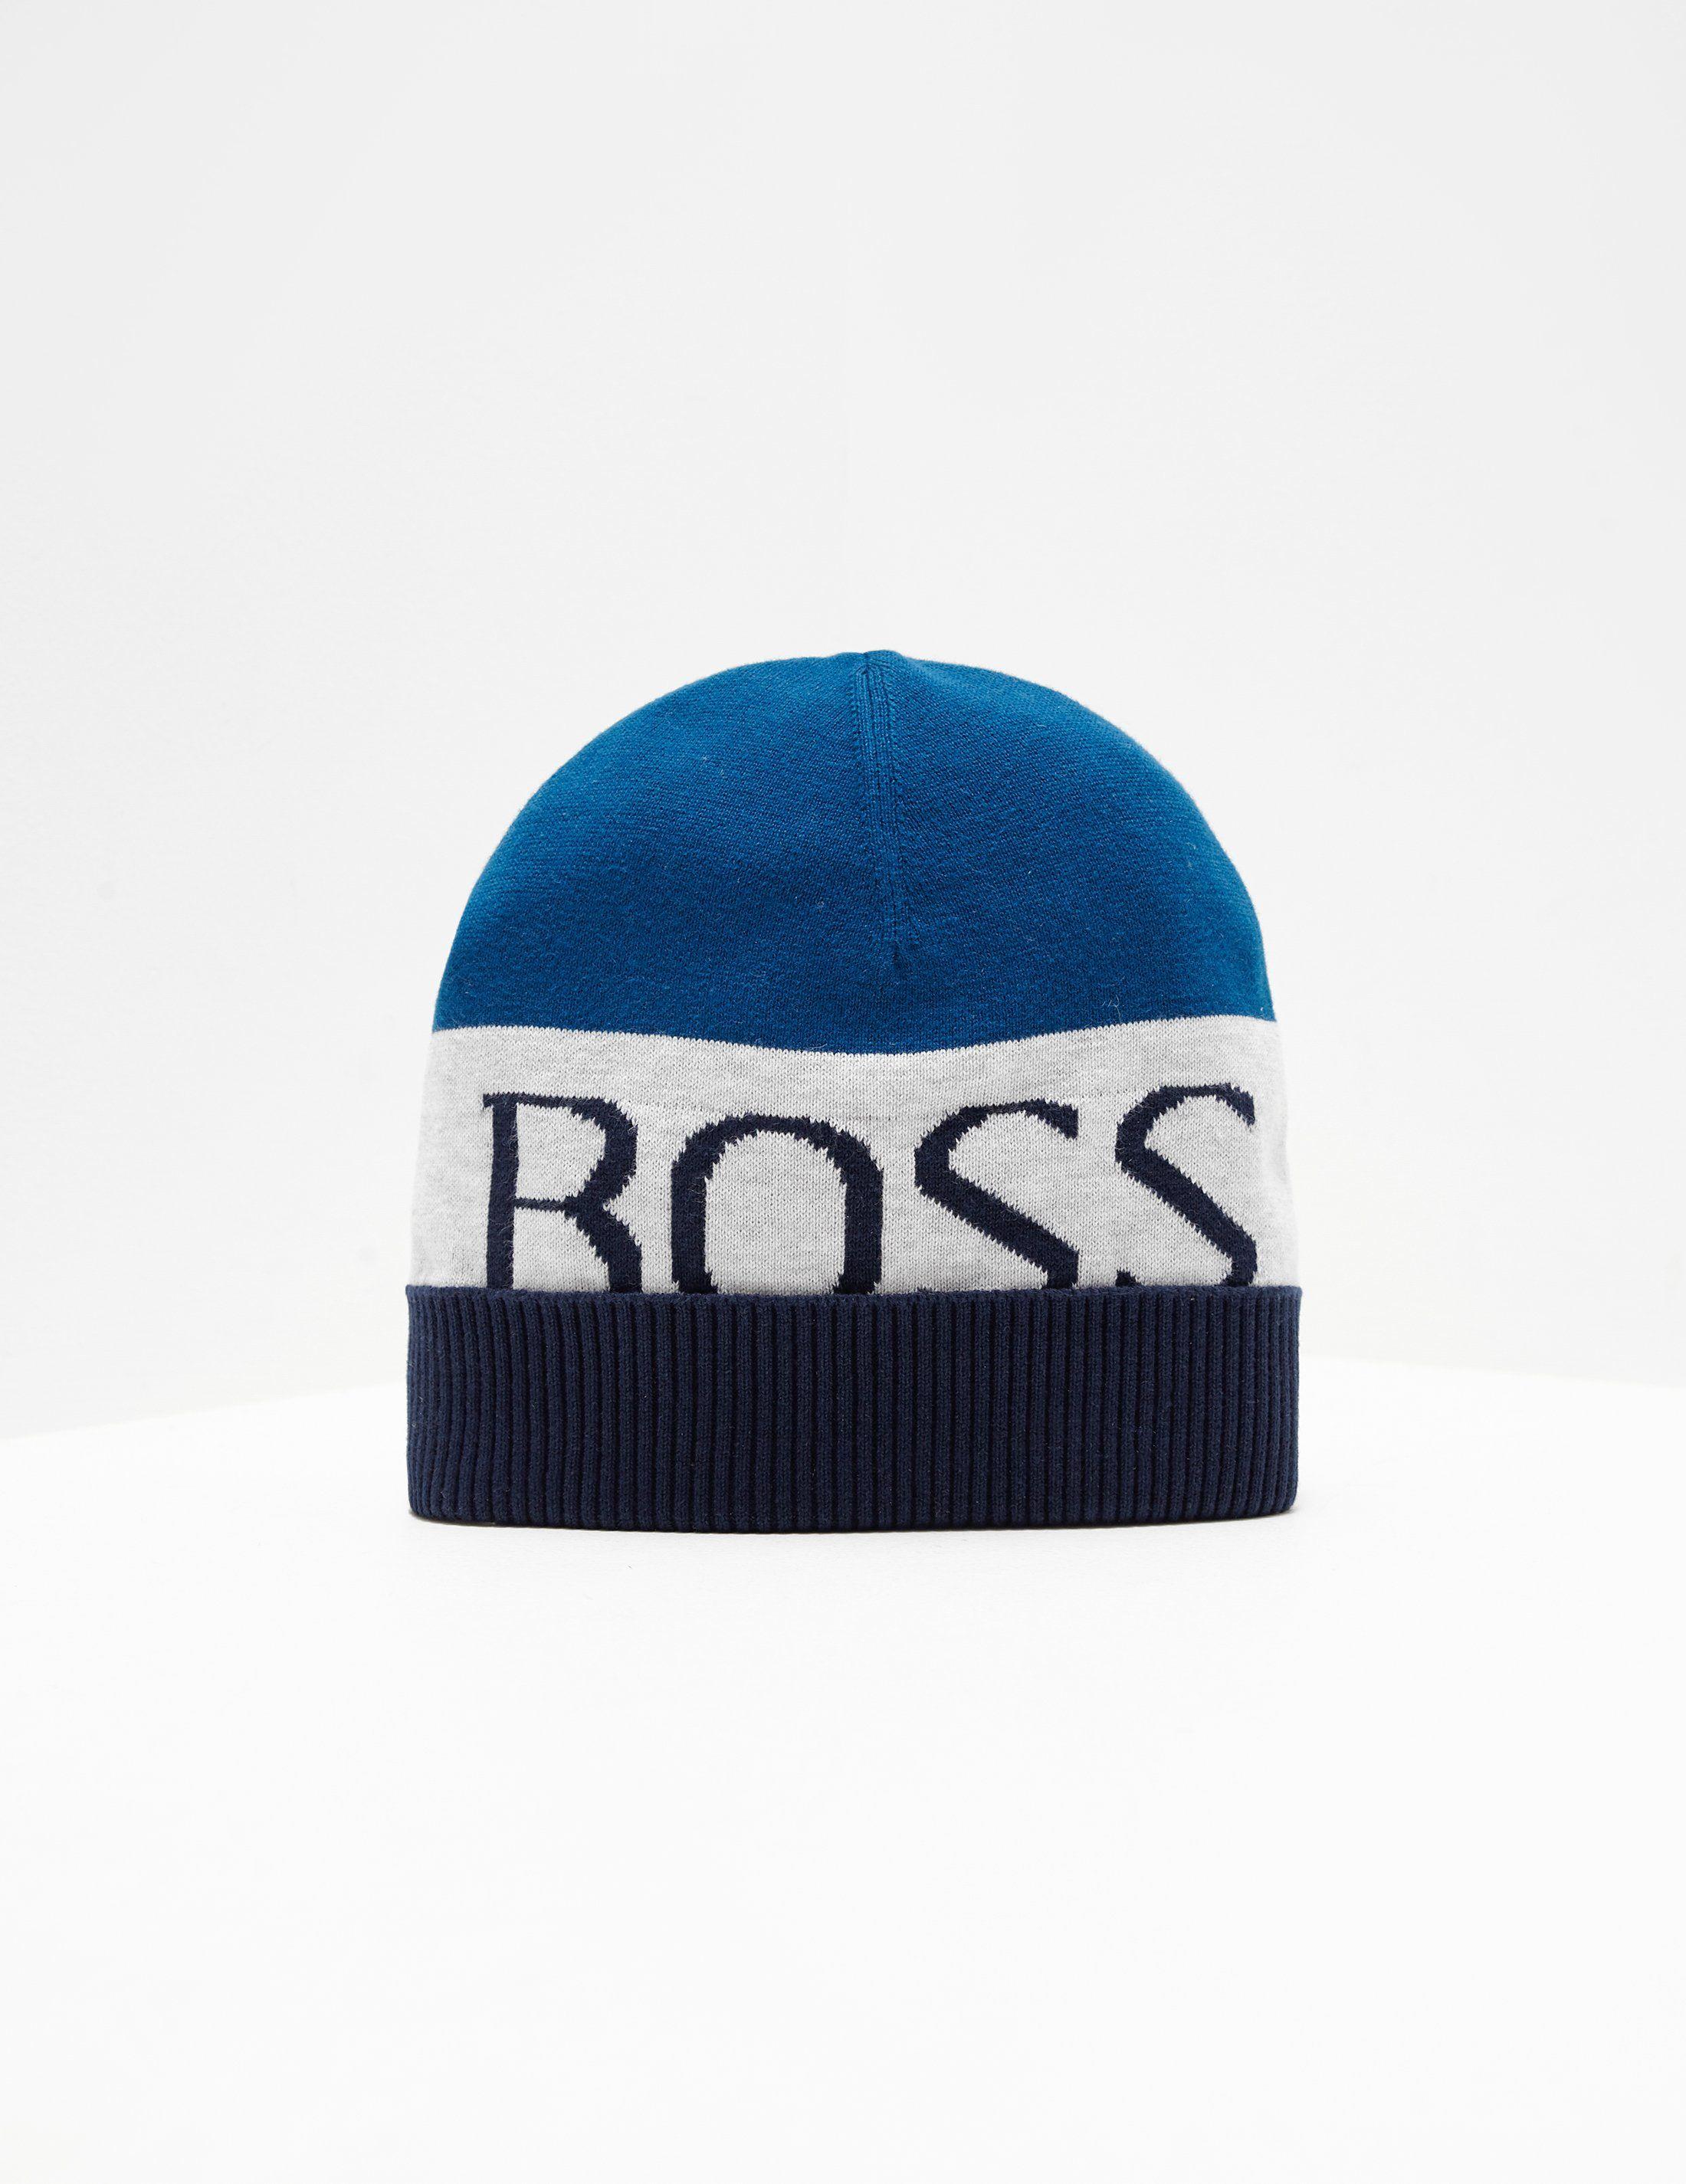 BOSS Logo Beanie